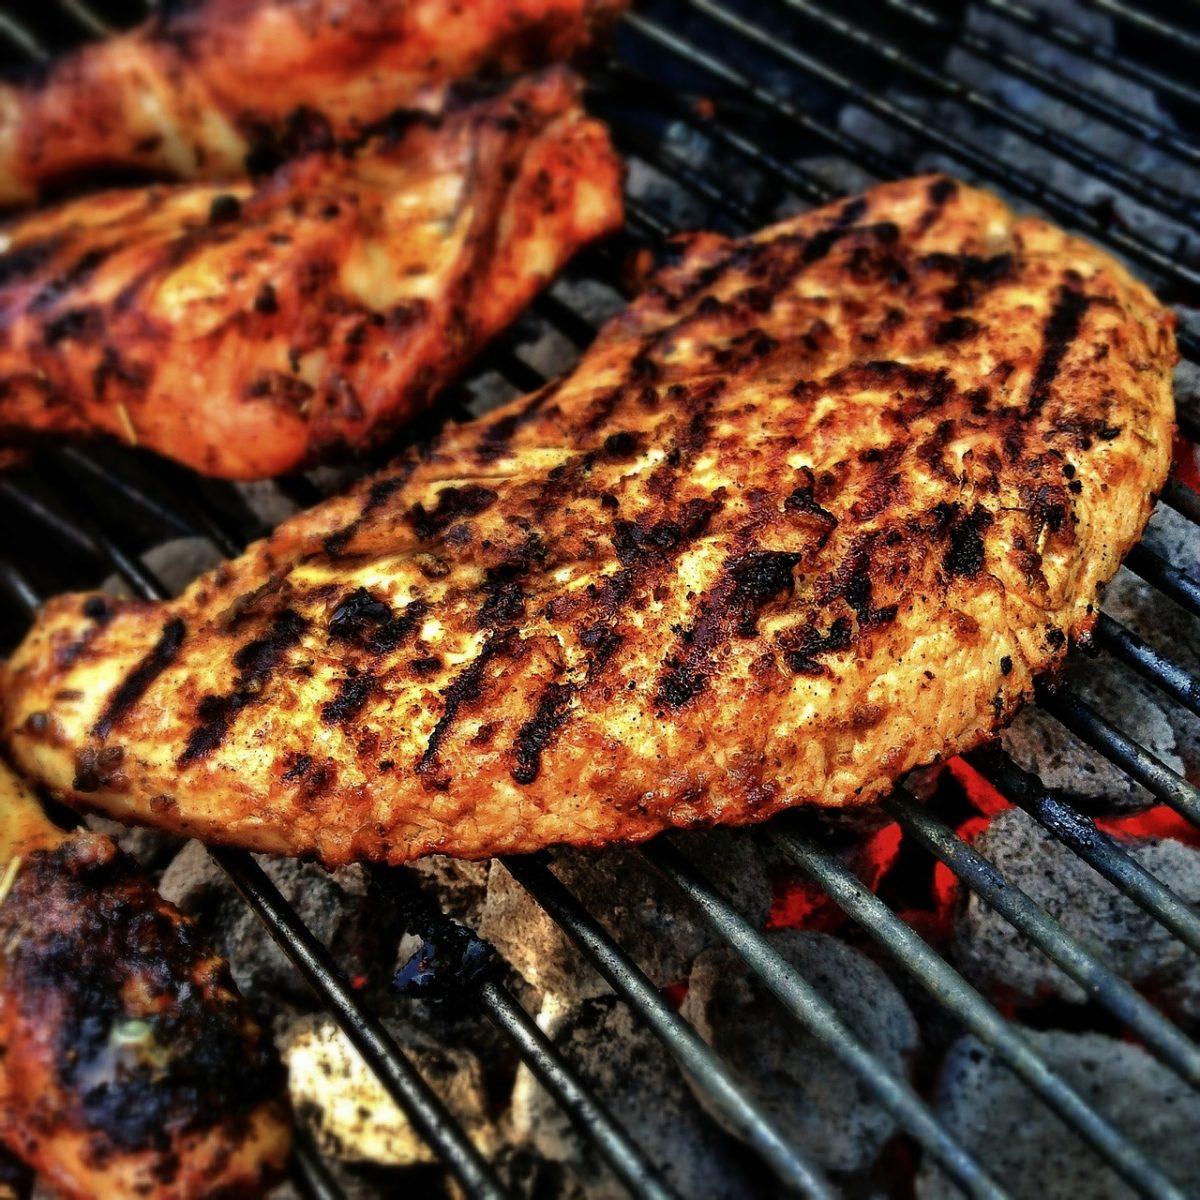 Grill Steak 1497183031